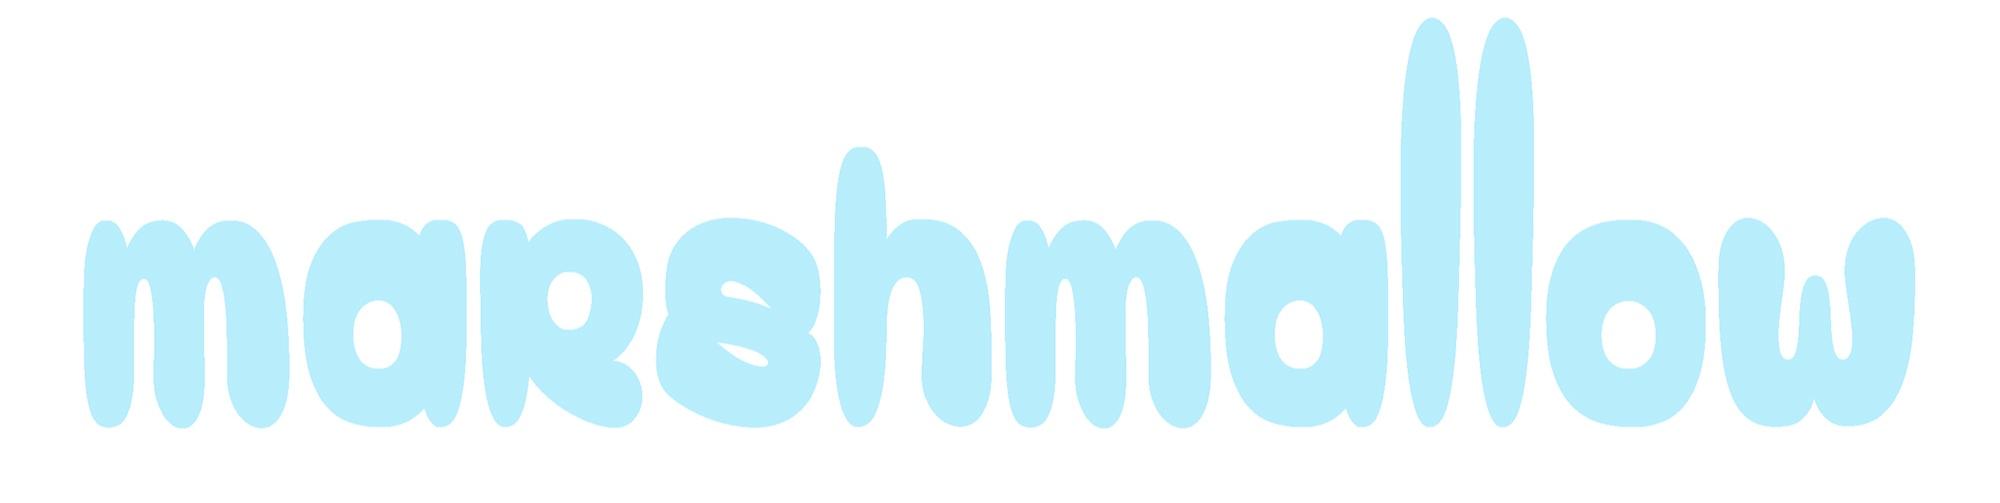 marshmallow+logo+light+blue+copy.jpg